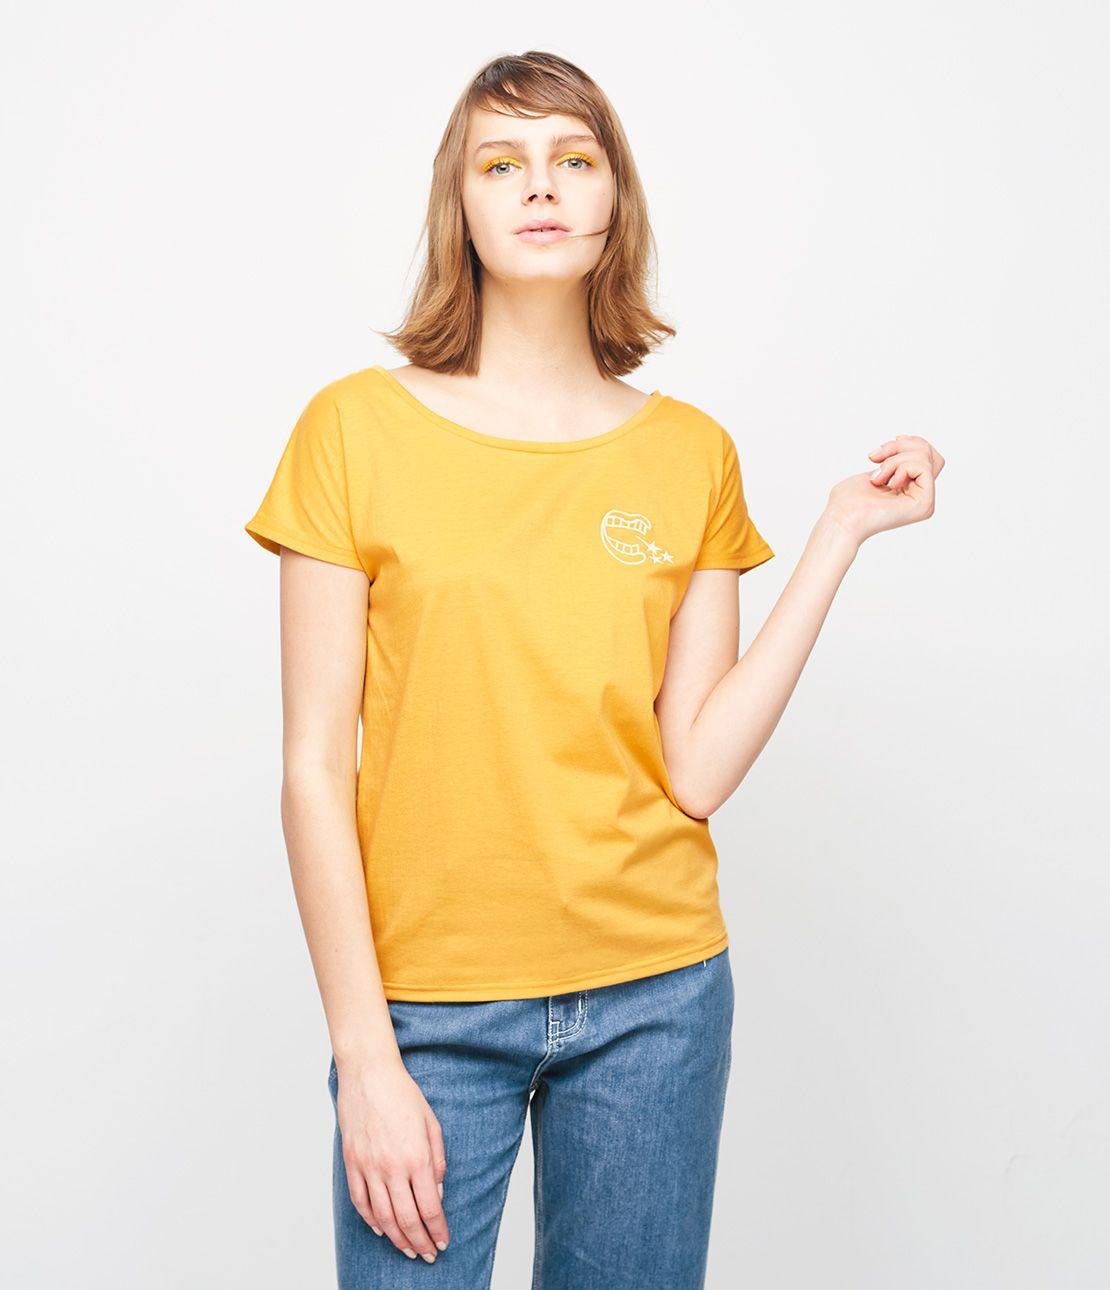 JRK Get Over It T-shirt